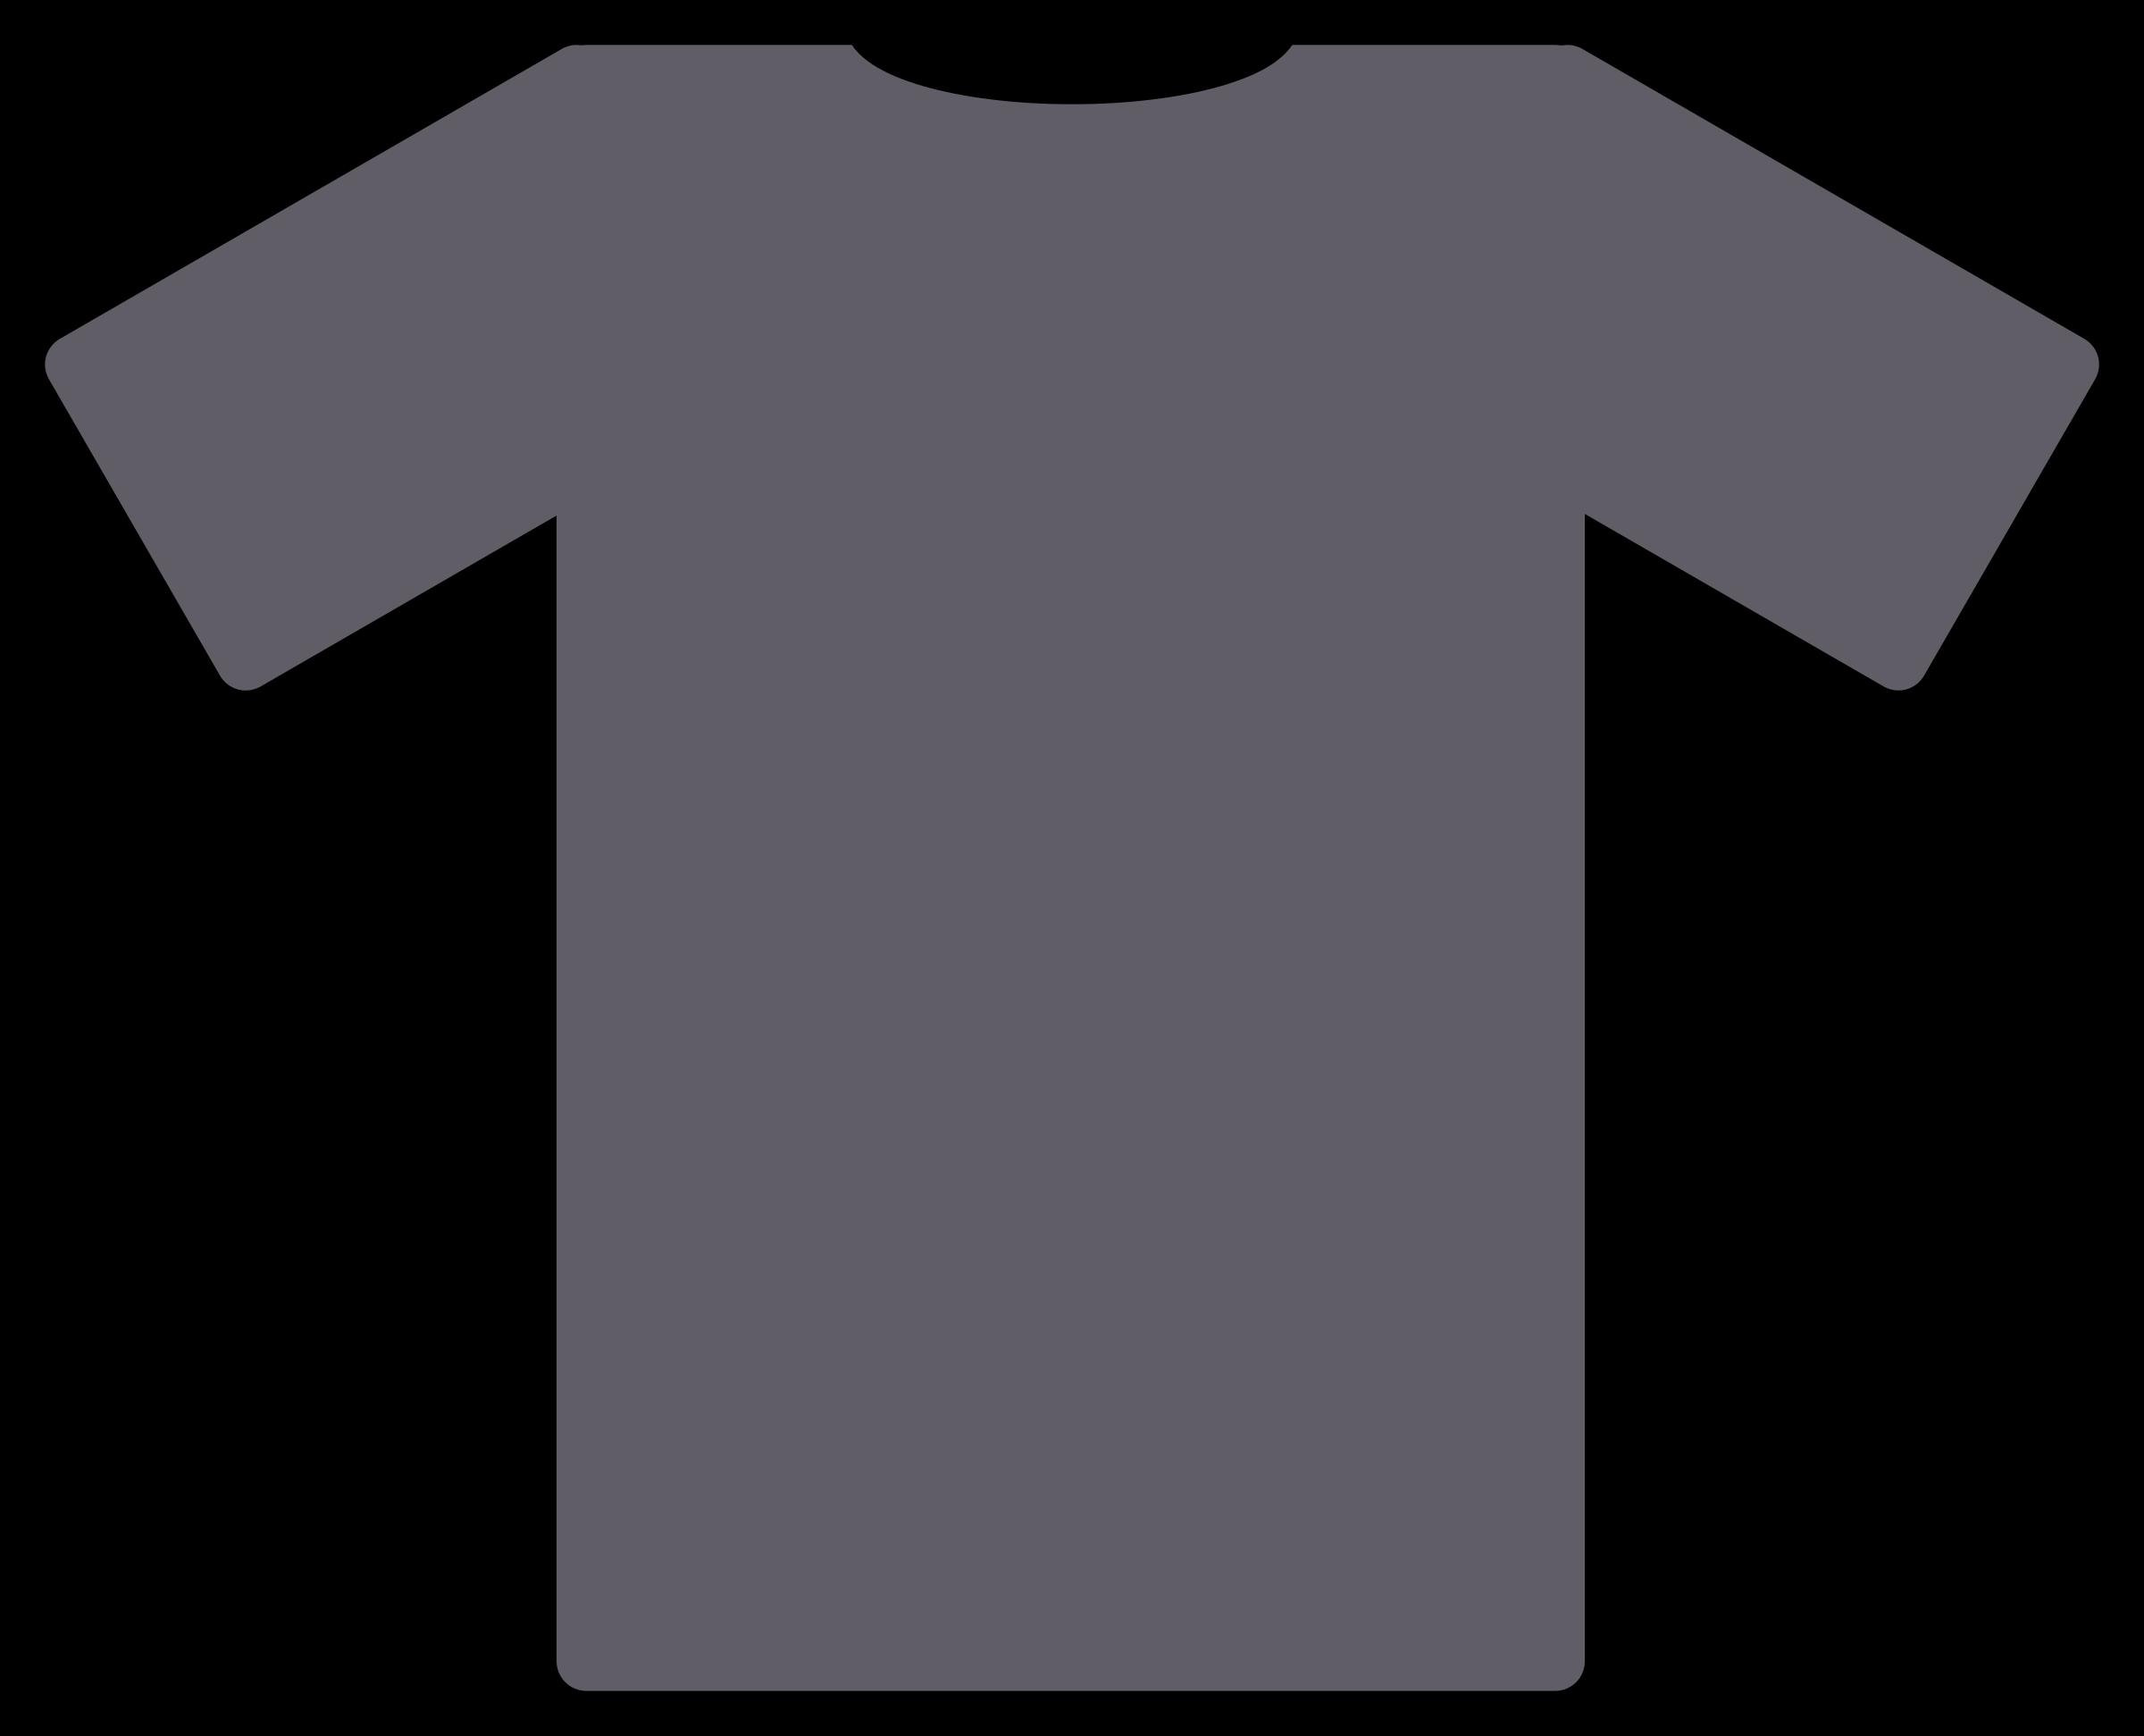 Gold clipart tshirt. Grey t shirt big